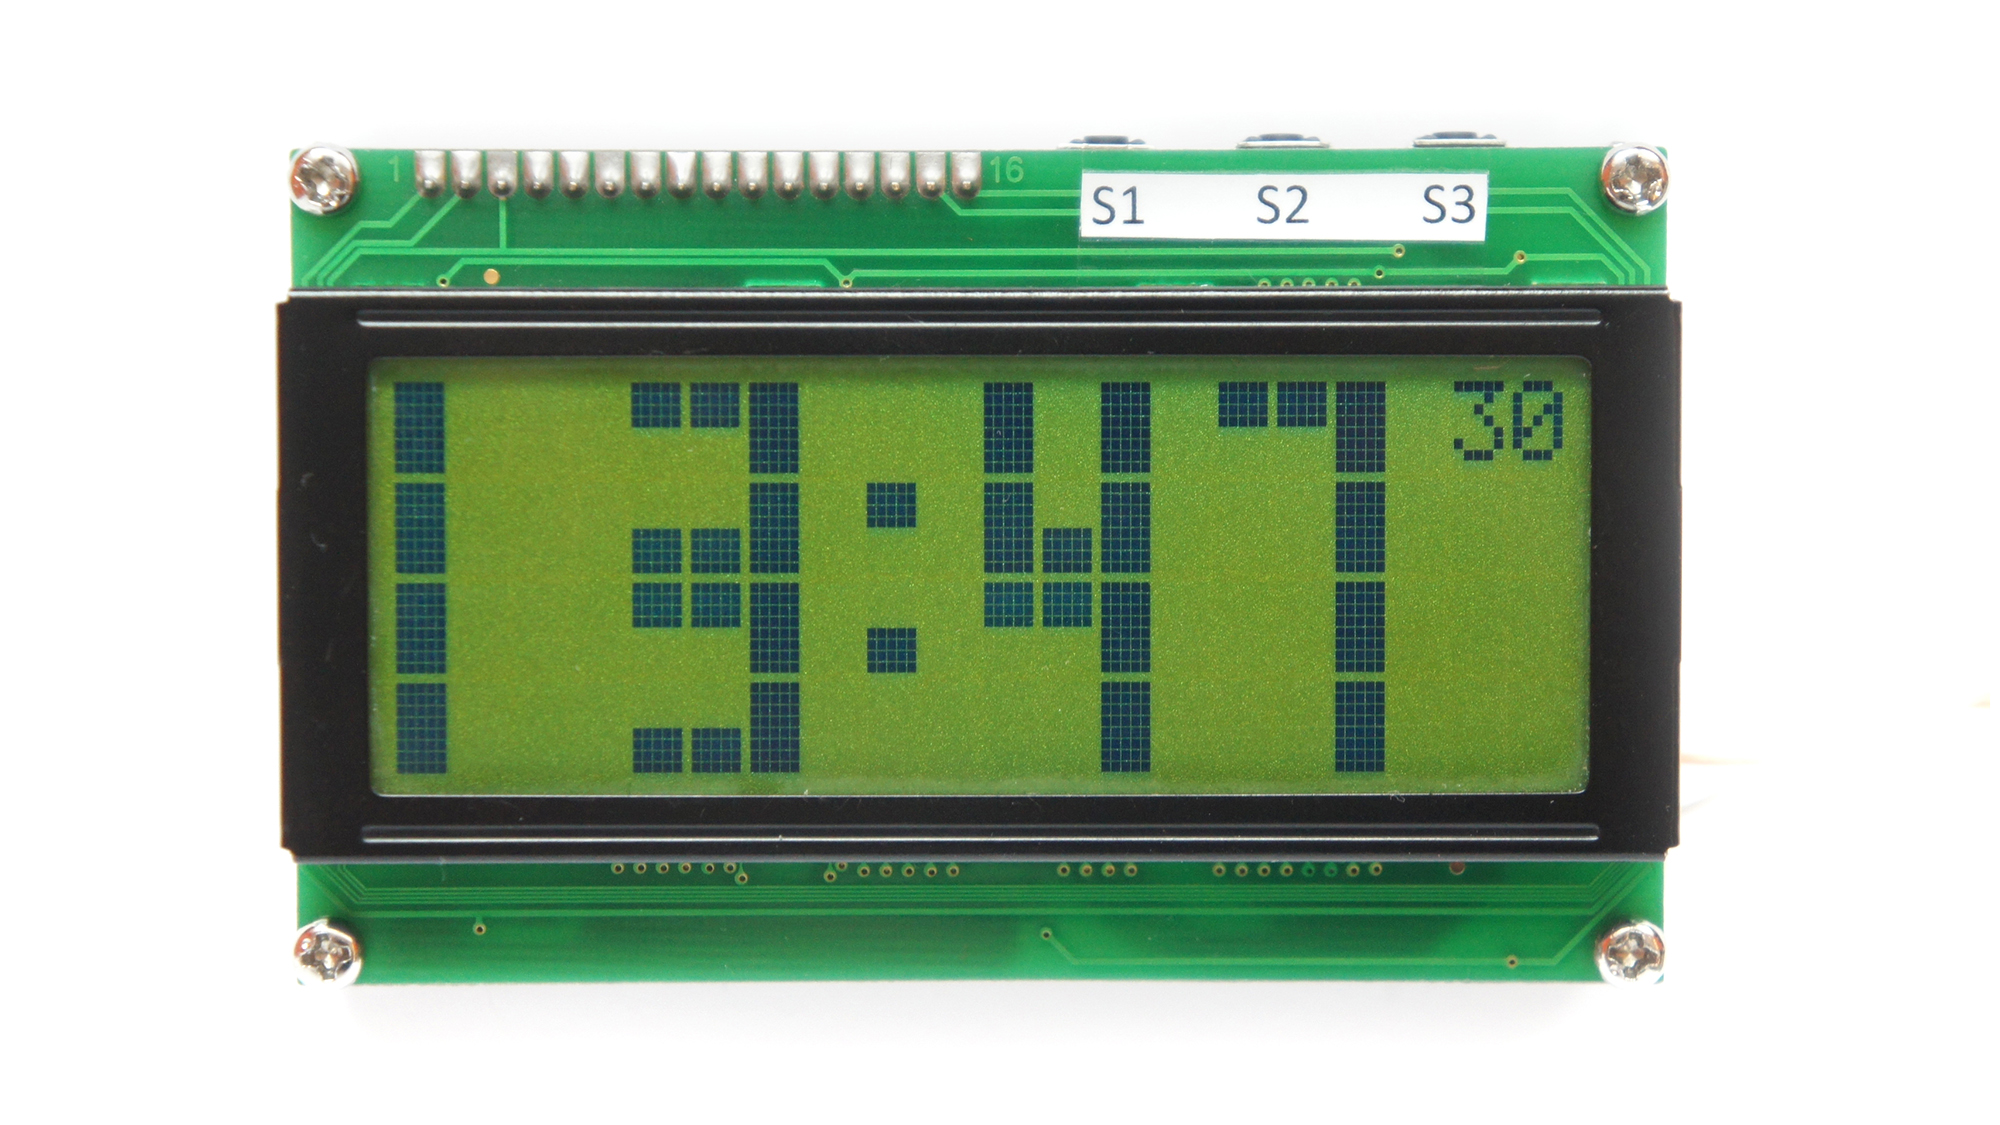 Zegar z termometrem: LCD 20x4, ATmega16, DS18B20, PCF8583P